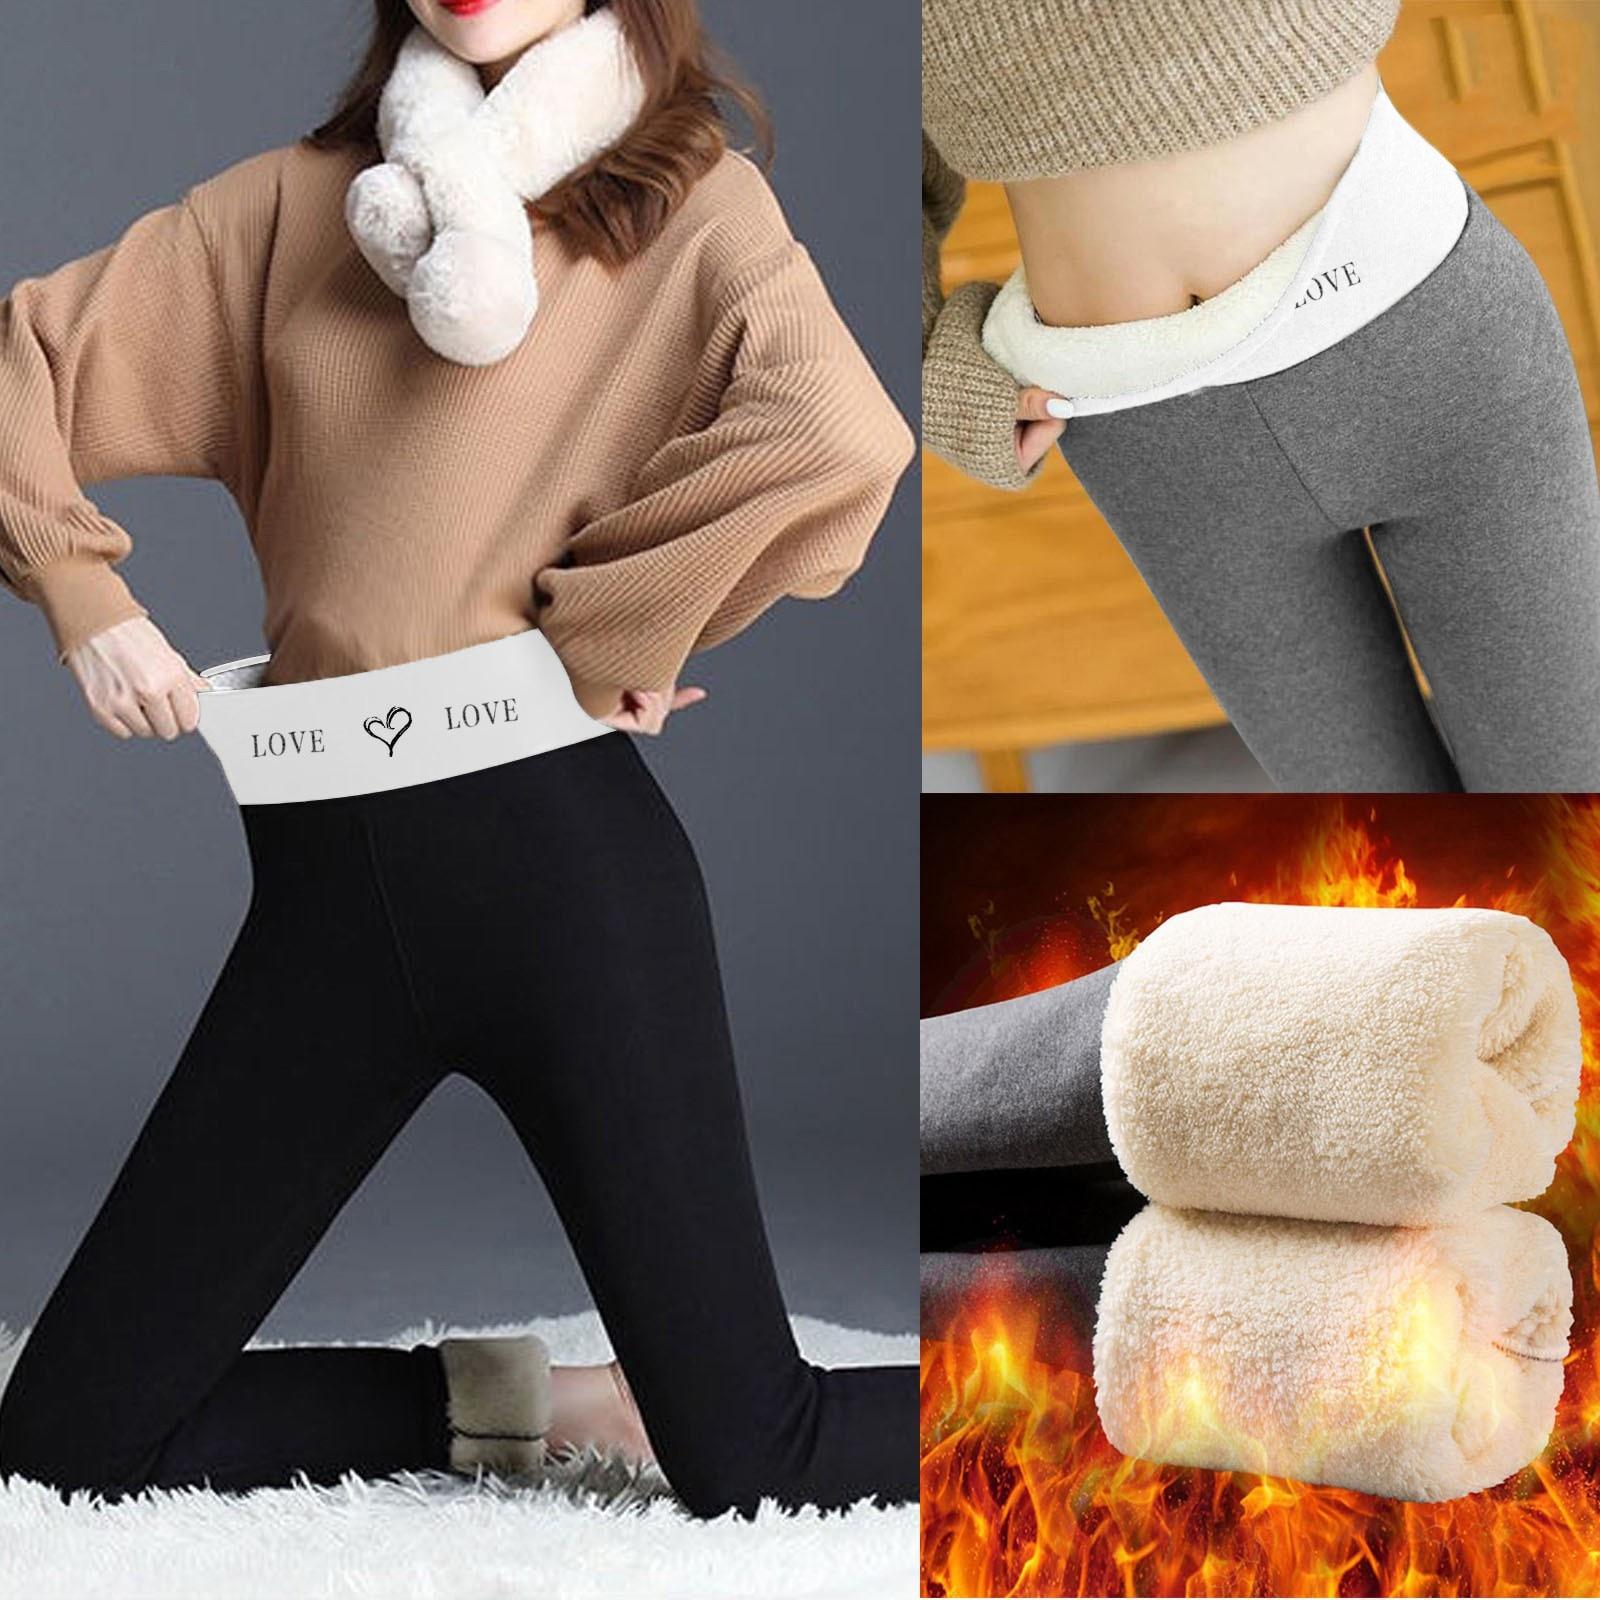 Winter Women Leggings Velvet Warm Pants Hight Waist Long Fashion Legging Comfortable Keep Stretchy